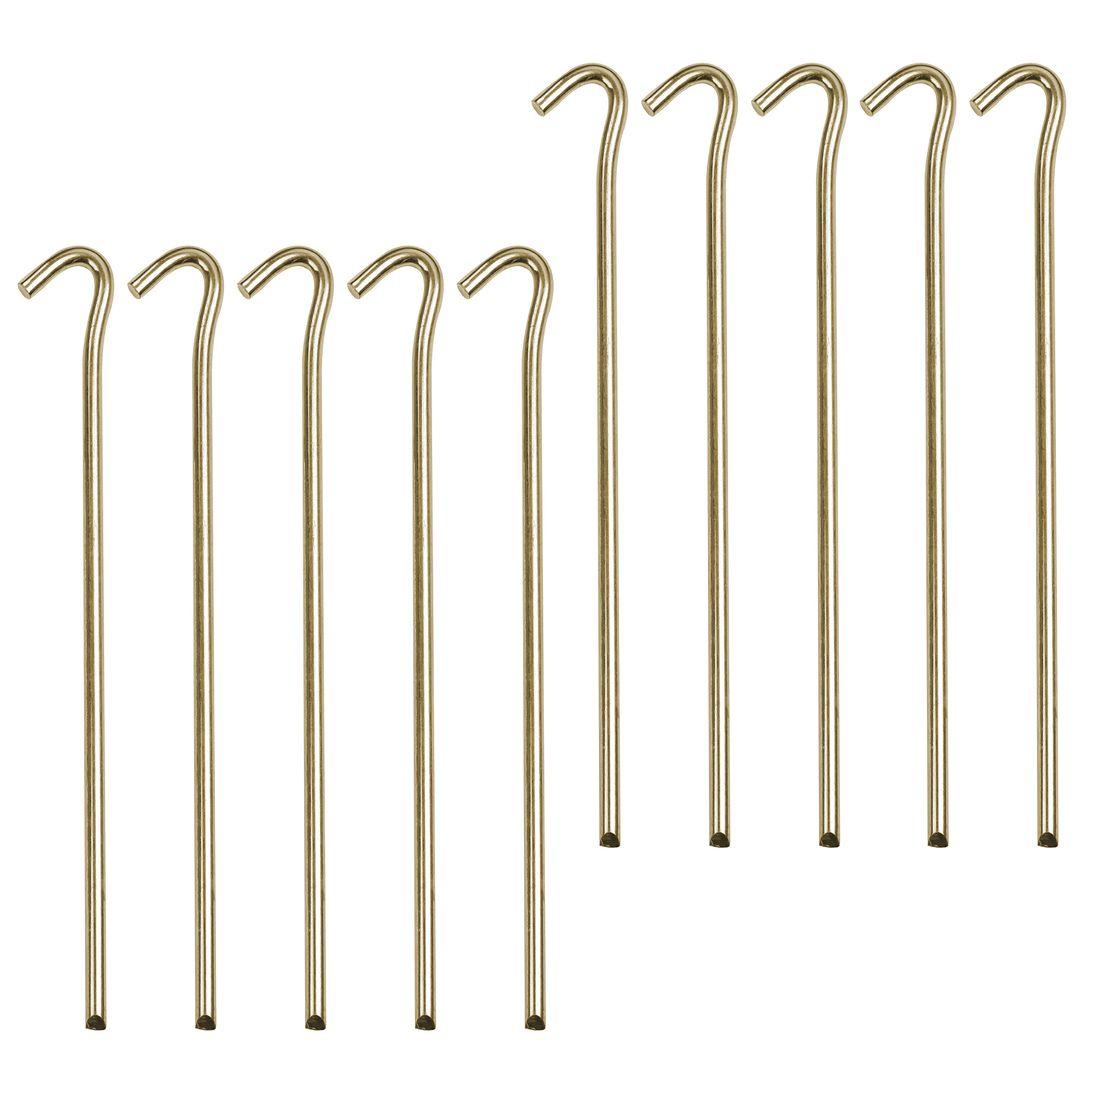 Set Peg IT 10VP 22SV10 Steel V-Profile-Pegs 18 x 220 mmTent Peg